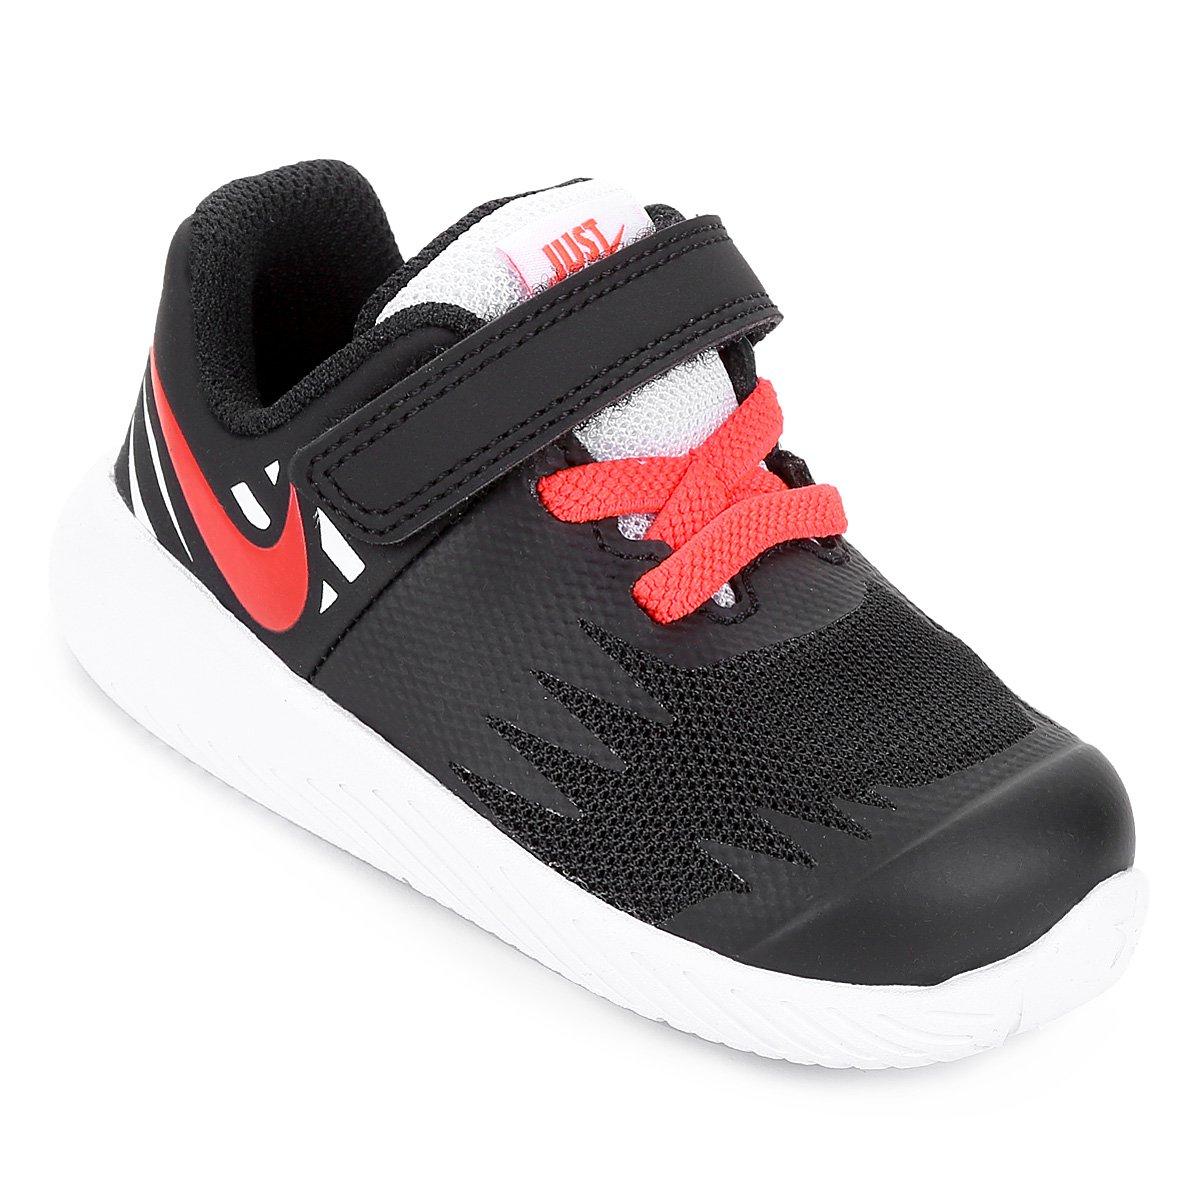 339760bb64a Tênis Infantil Nike Star Runner Masculino - Preto e Branco - Compre Agora